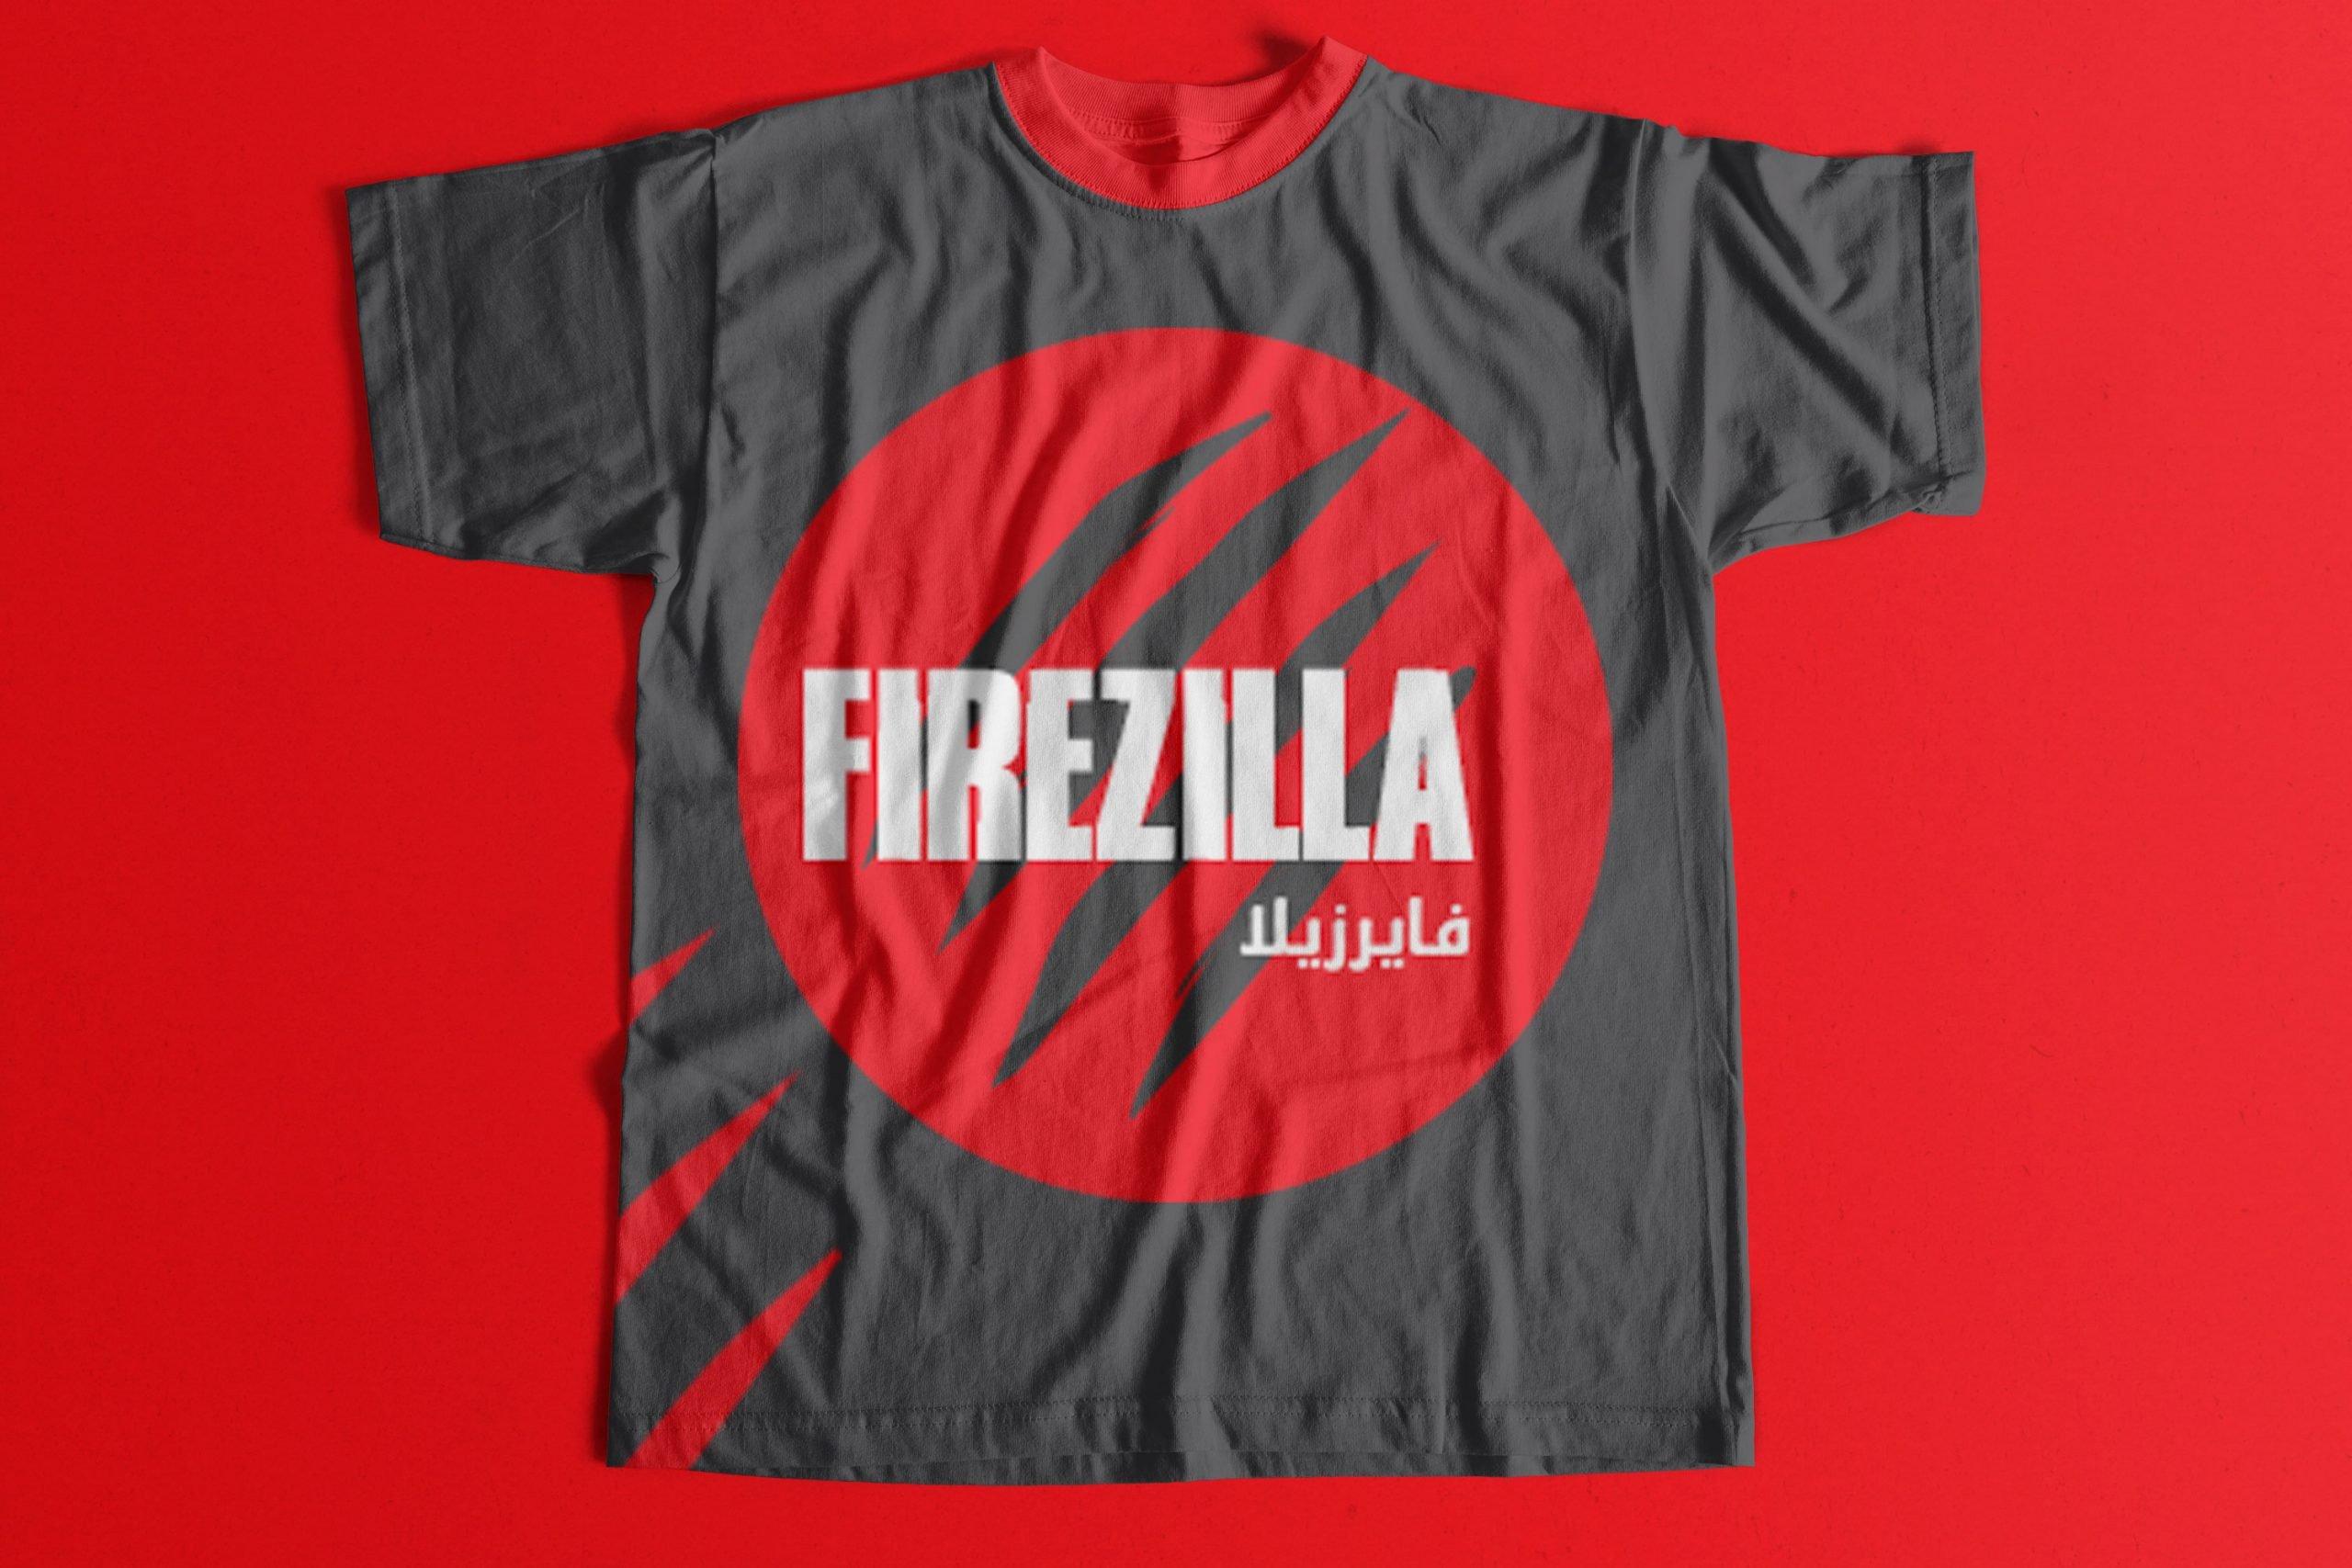 Firezilla Tshirt Momenarts